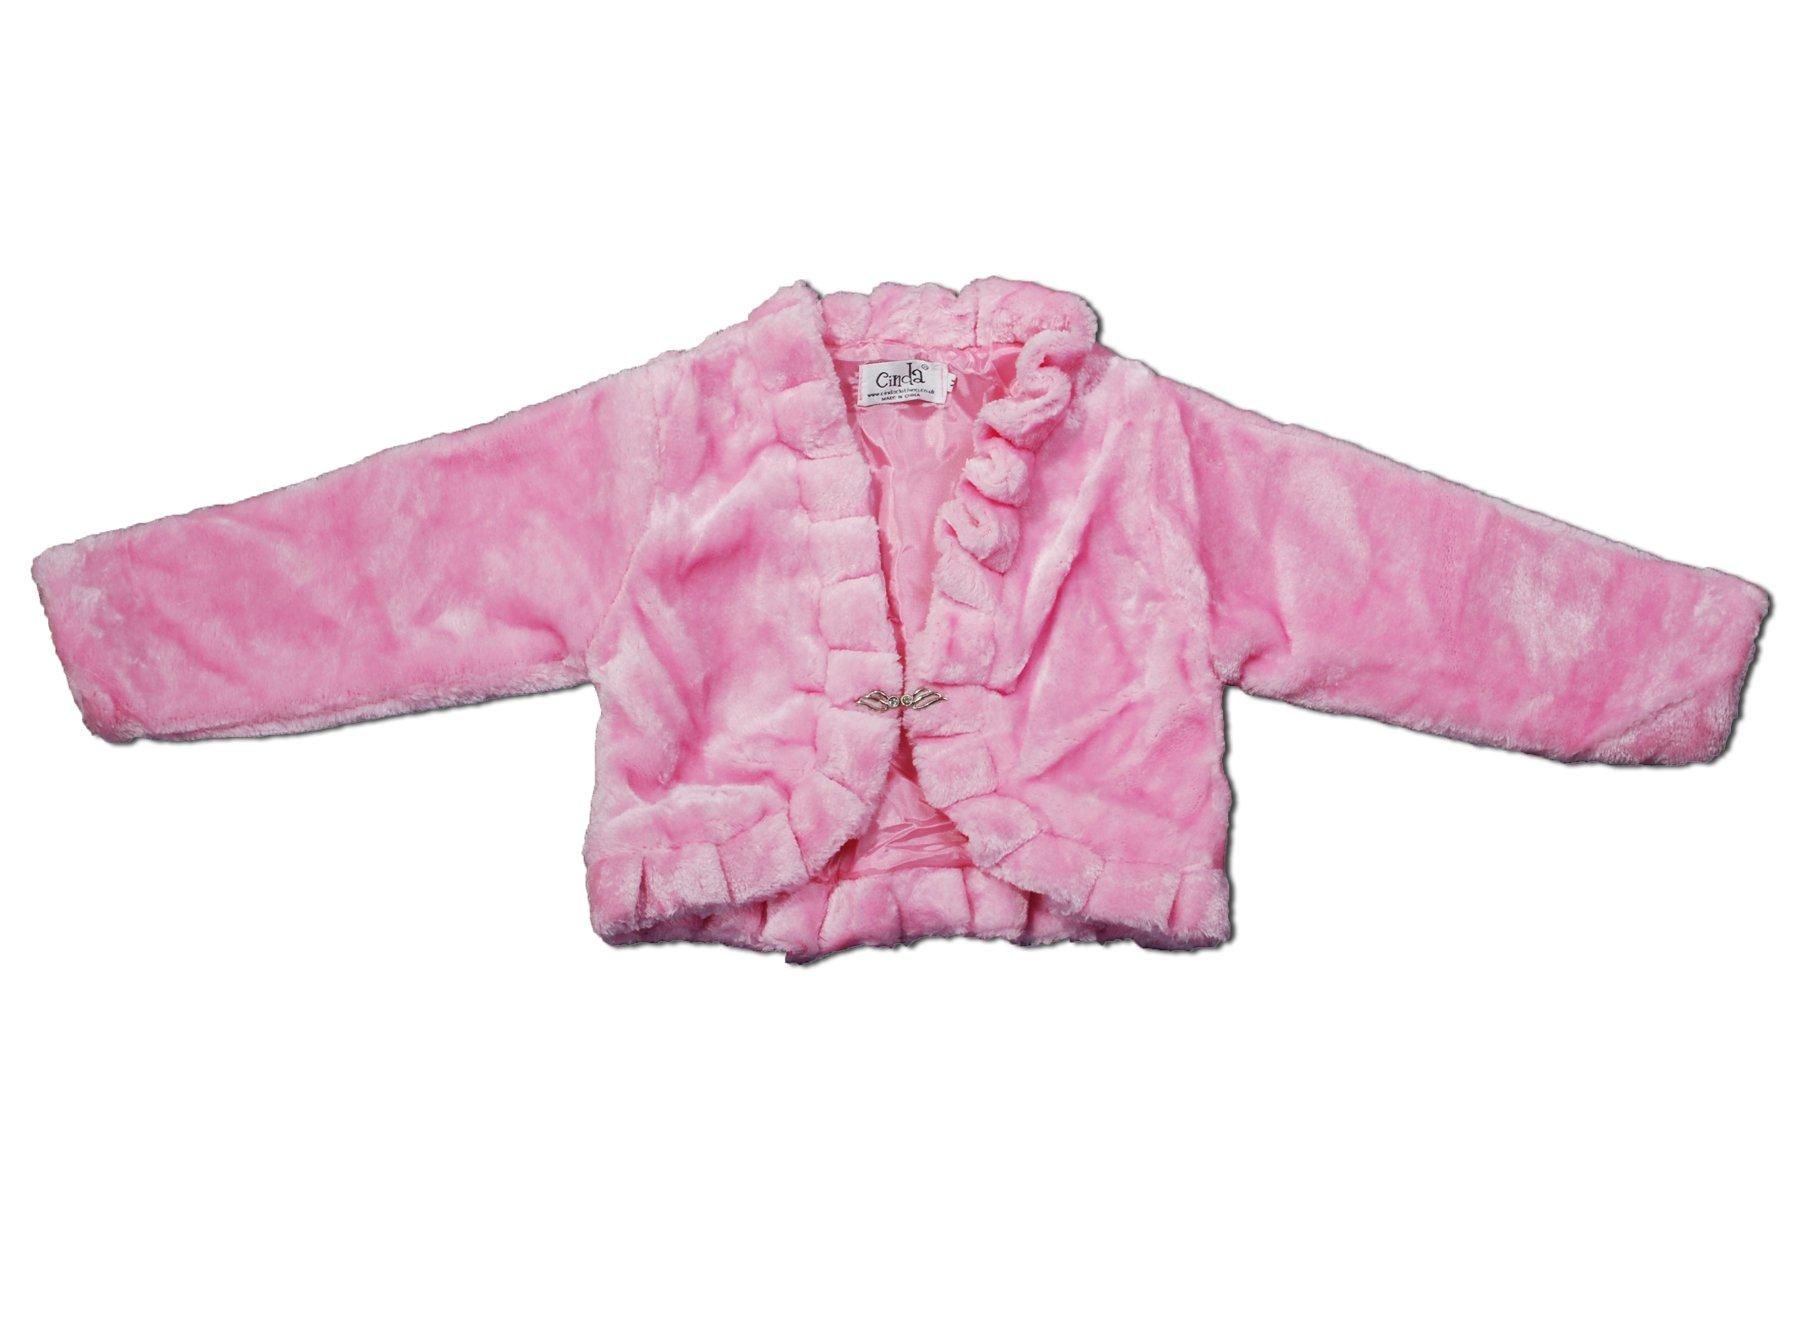 Cinda Clothing Big Girls' Long Sleeve Faux Fur Coat Bolero 7-8 Years Pink